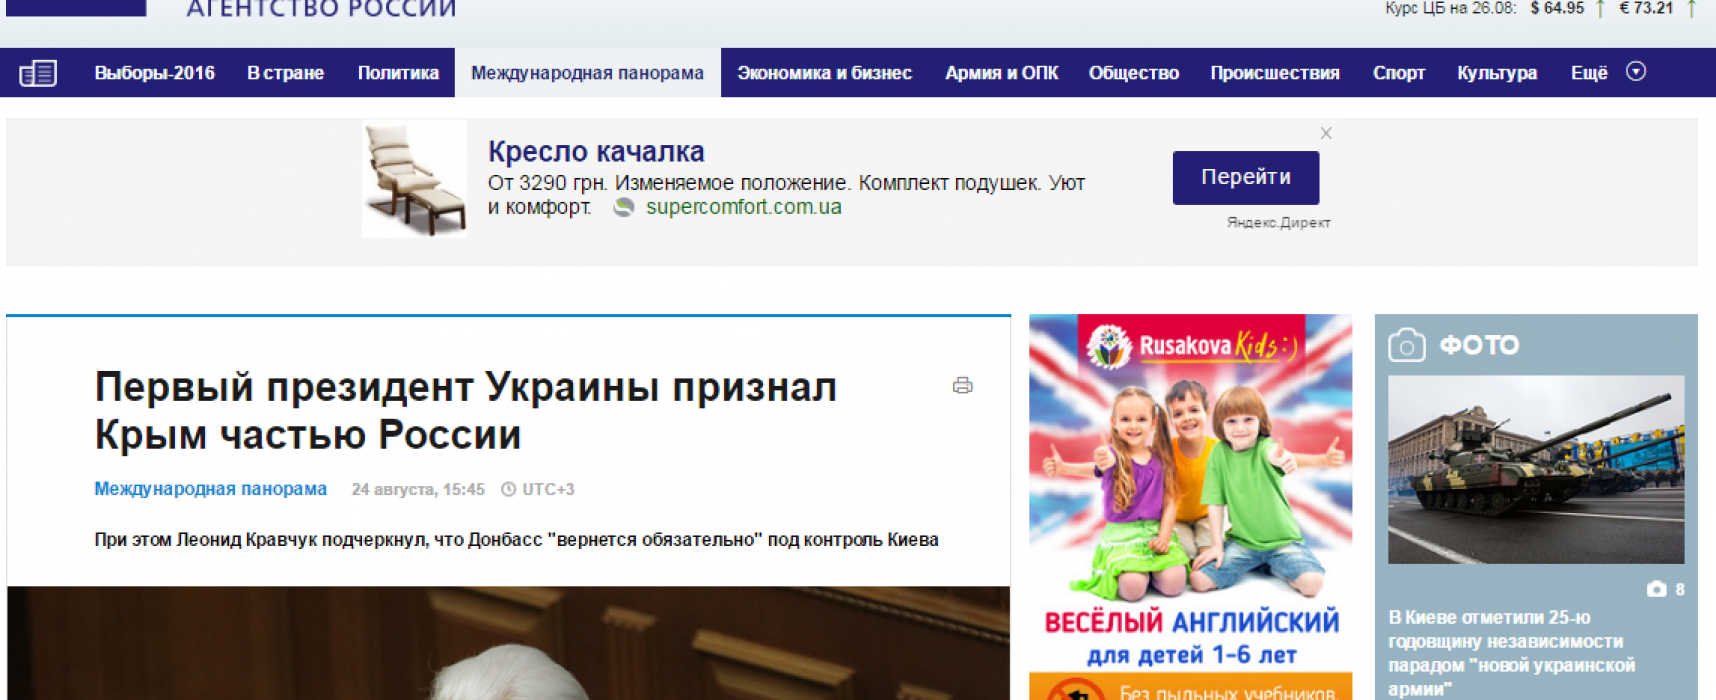 Falso: El primer presidente ucraniano reconoció a Crimea como si fuera la parte de Rusia